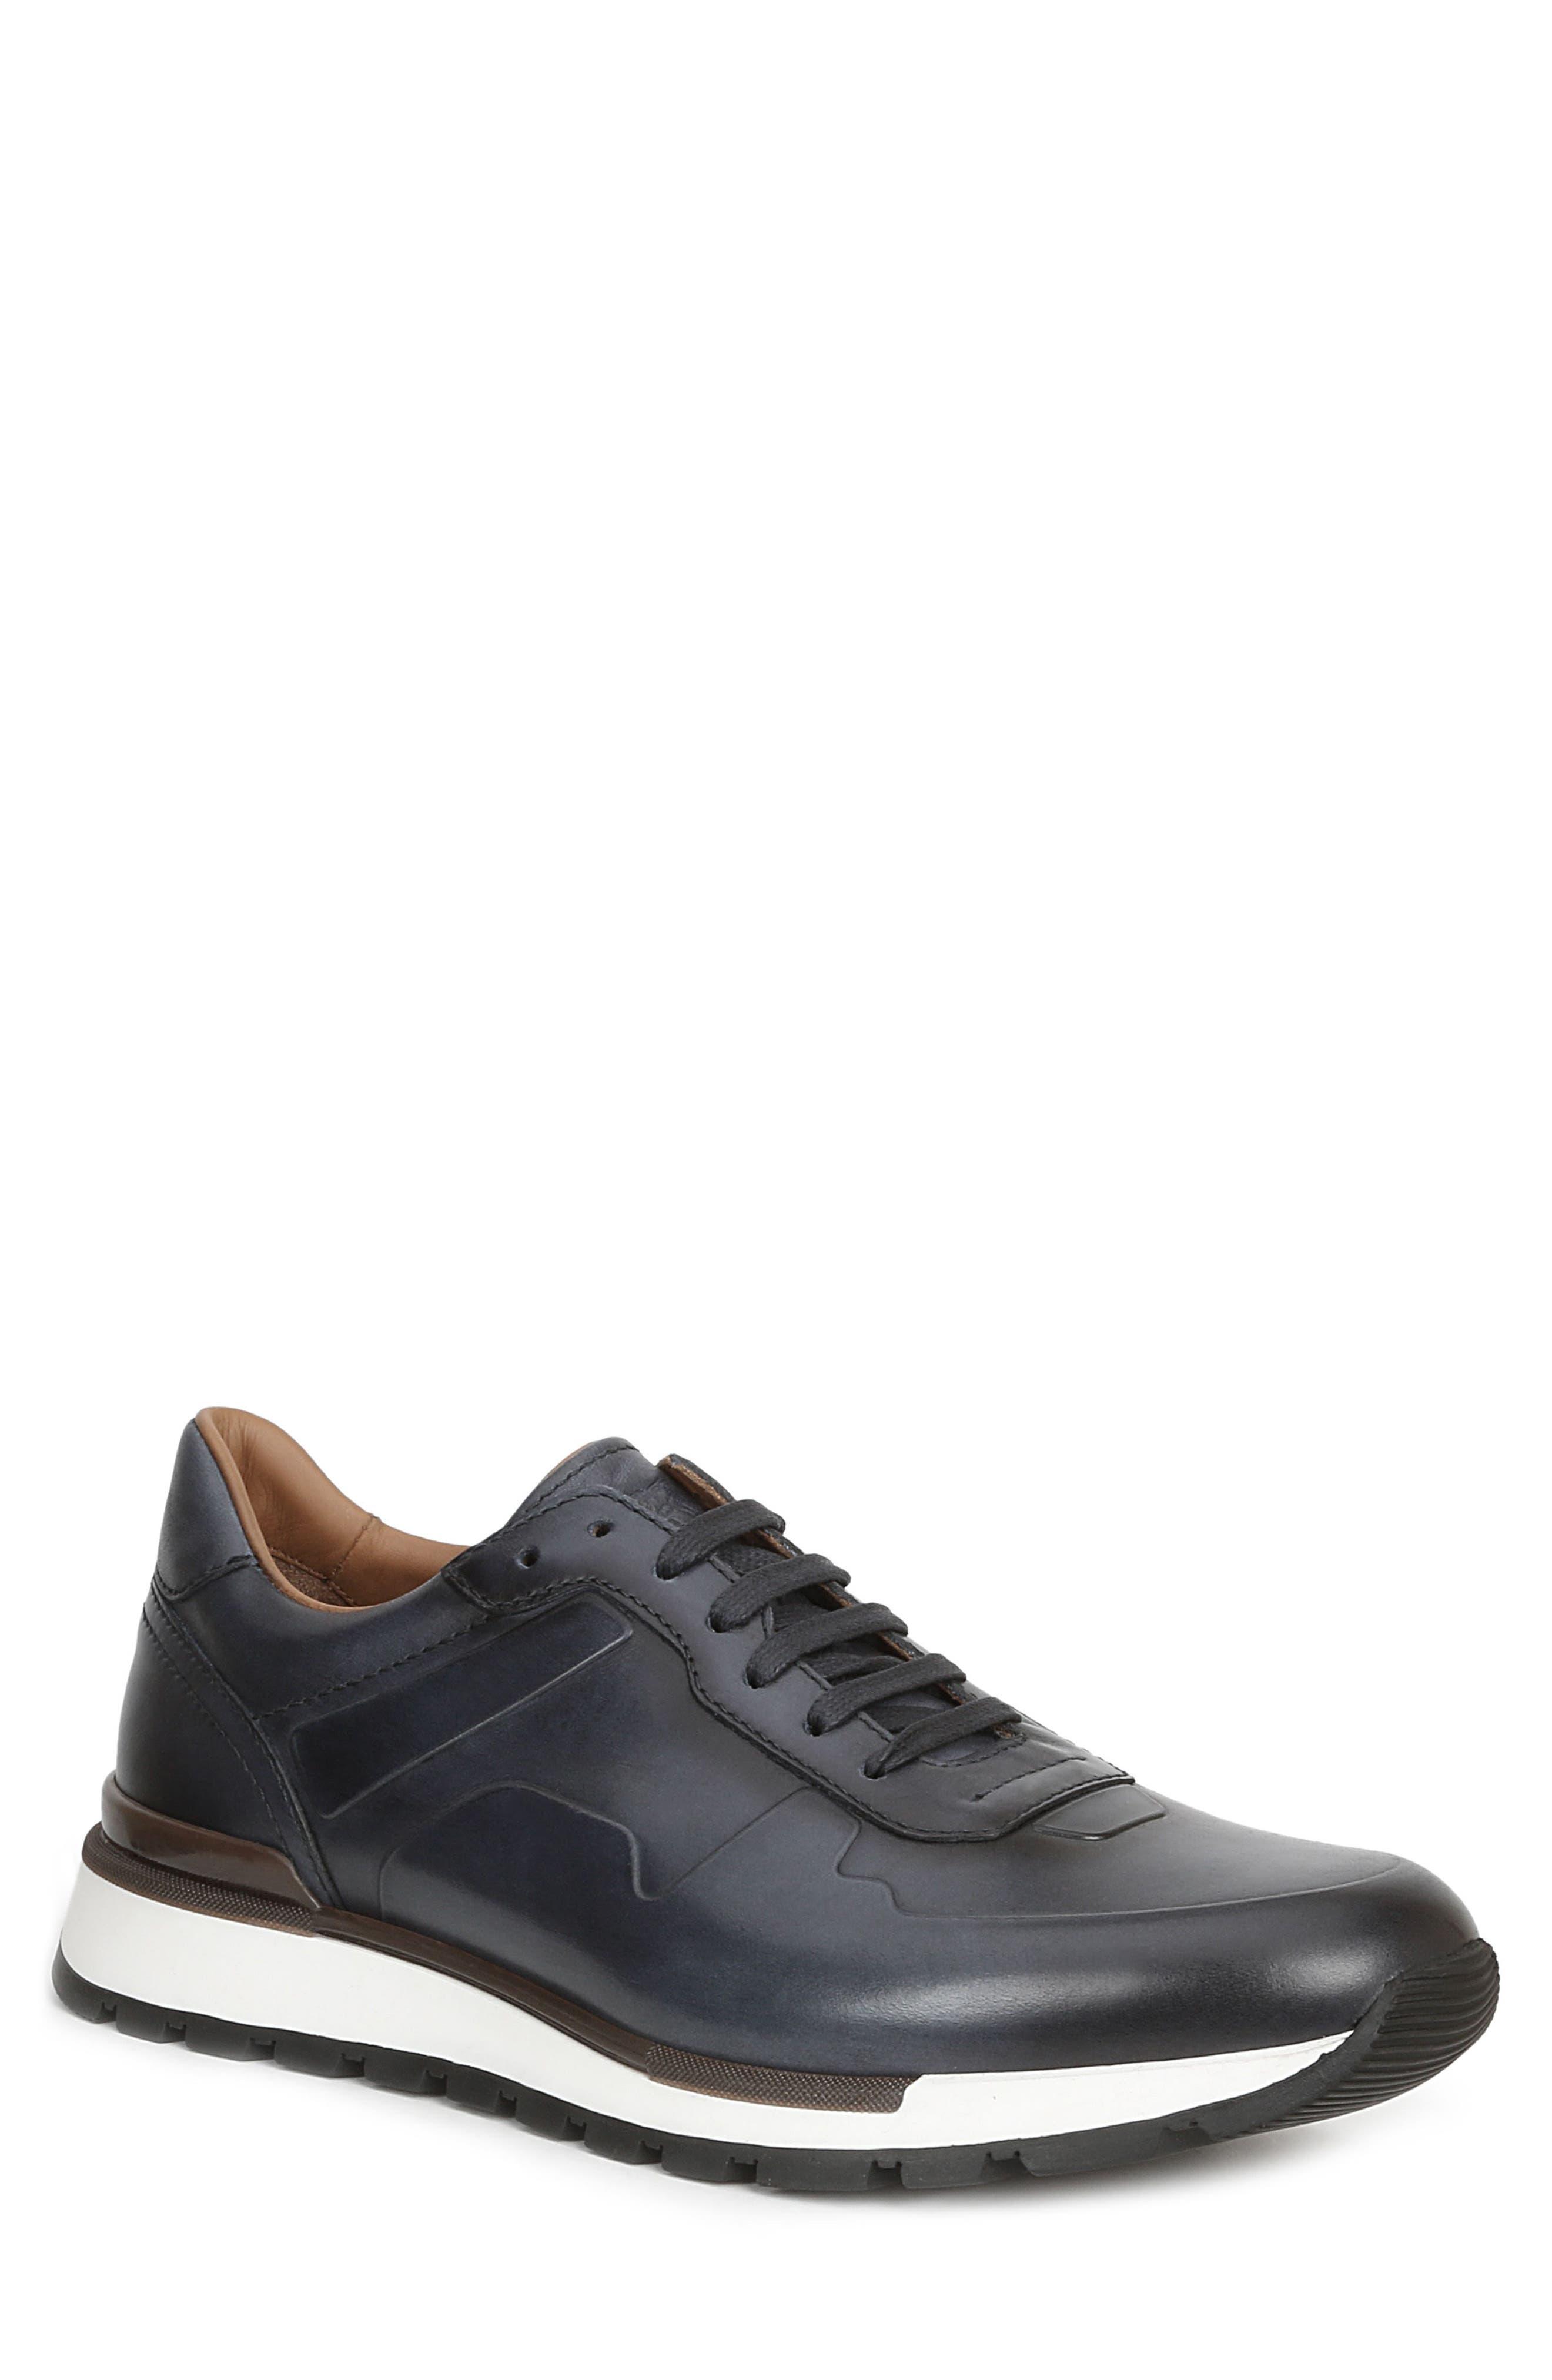 Davio Low Top Sneaker,                             Main thumbnail 1, color,                             Navy